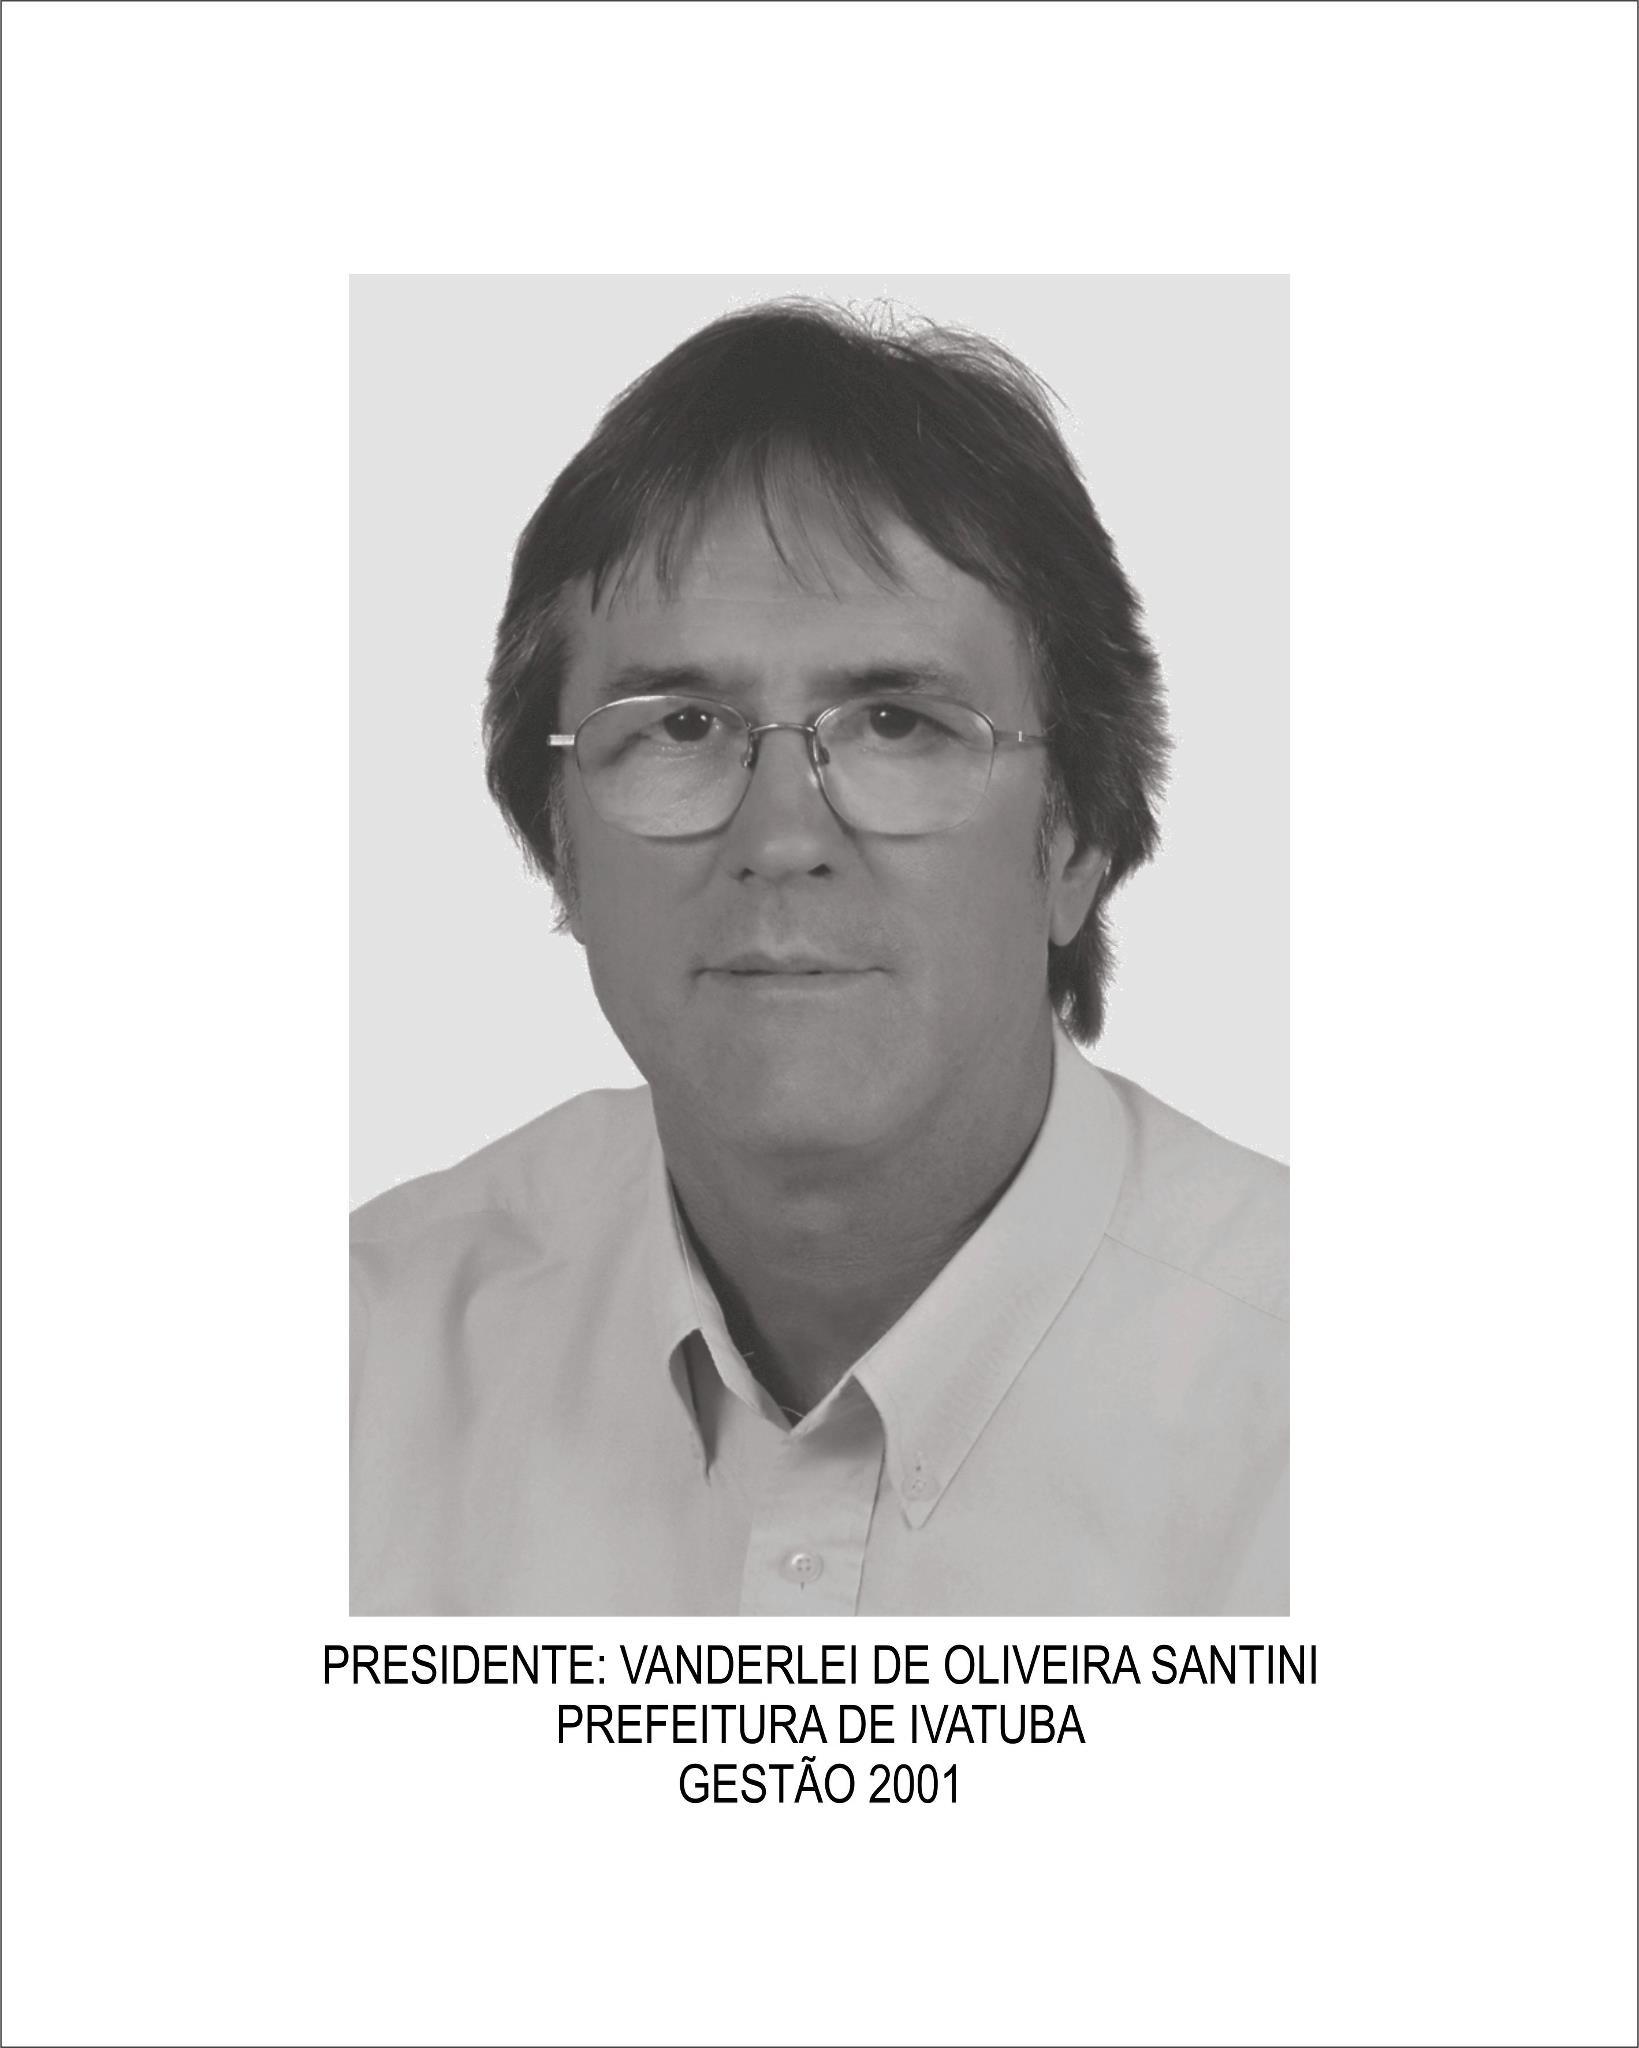 Vanderlei de Oliveira Santini